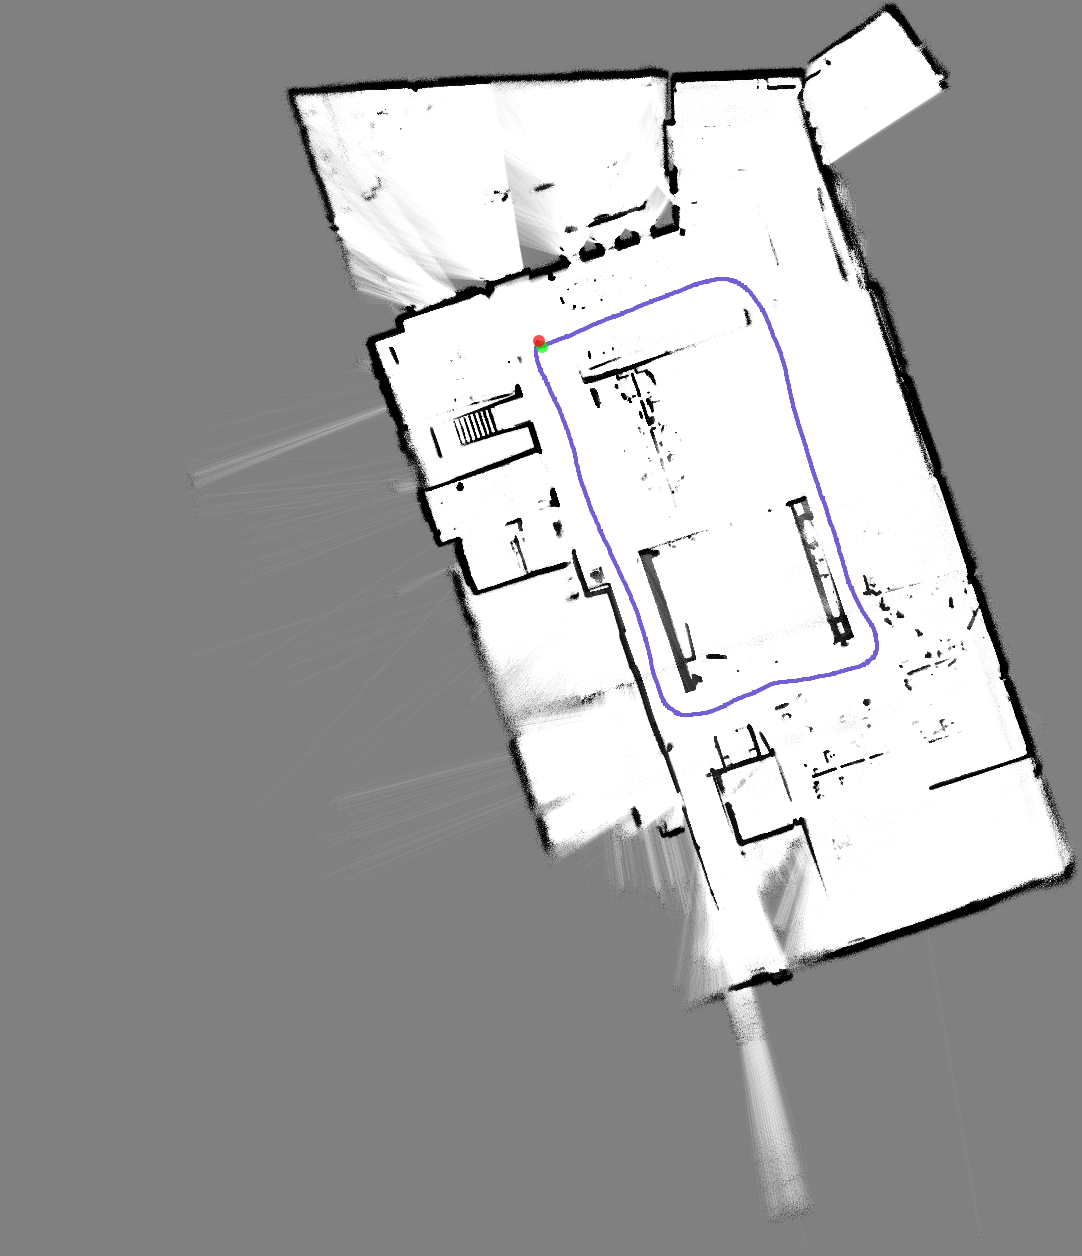 cartographer_cart_2d_probability_grid